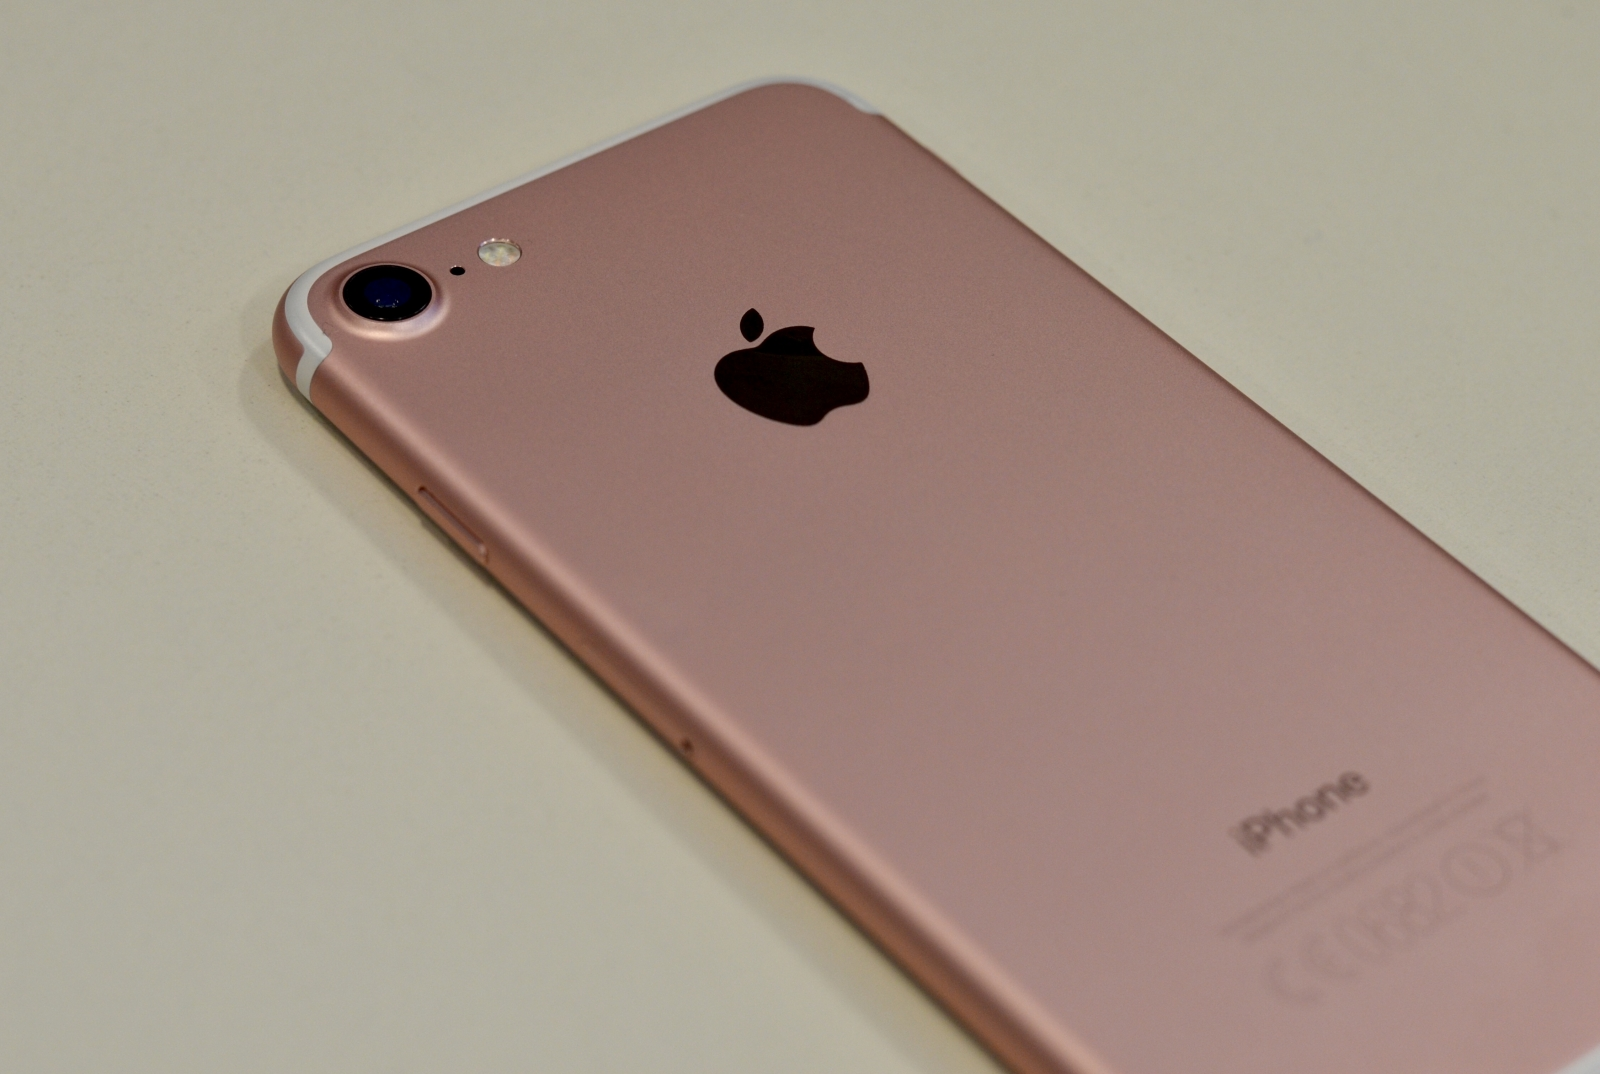 Apple iPhone 7 back rose gold